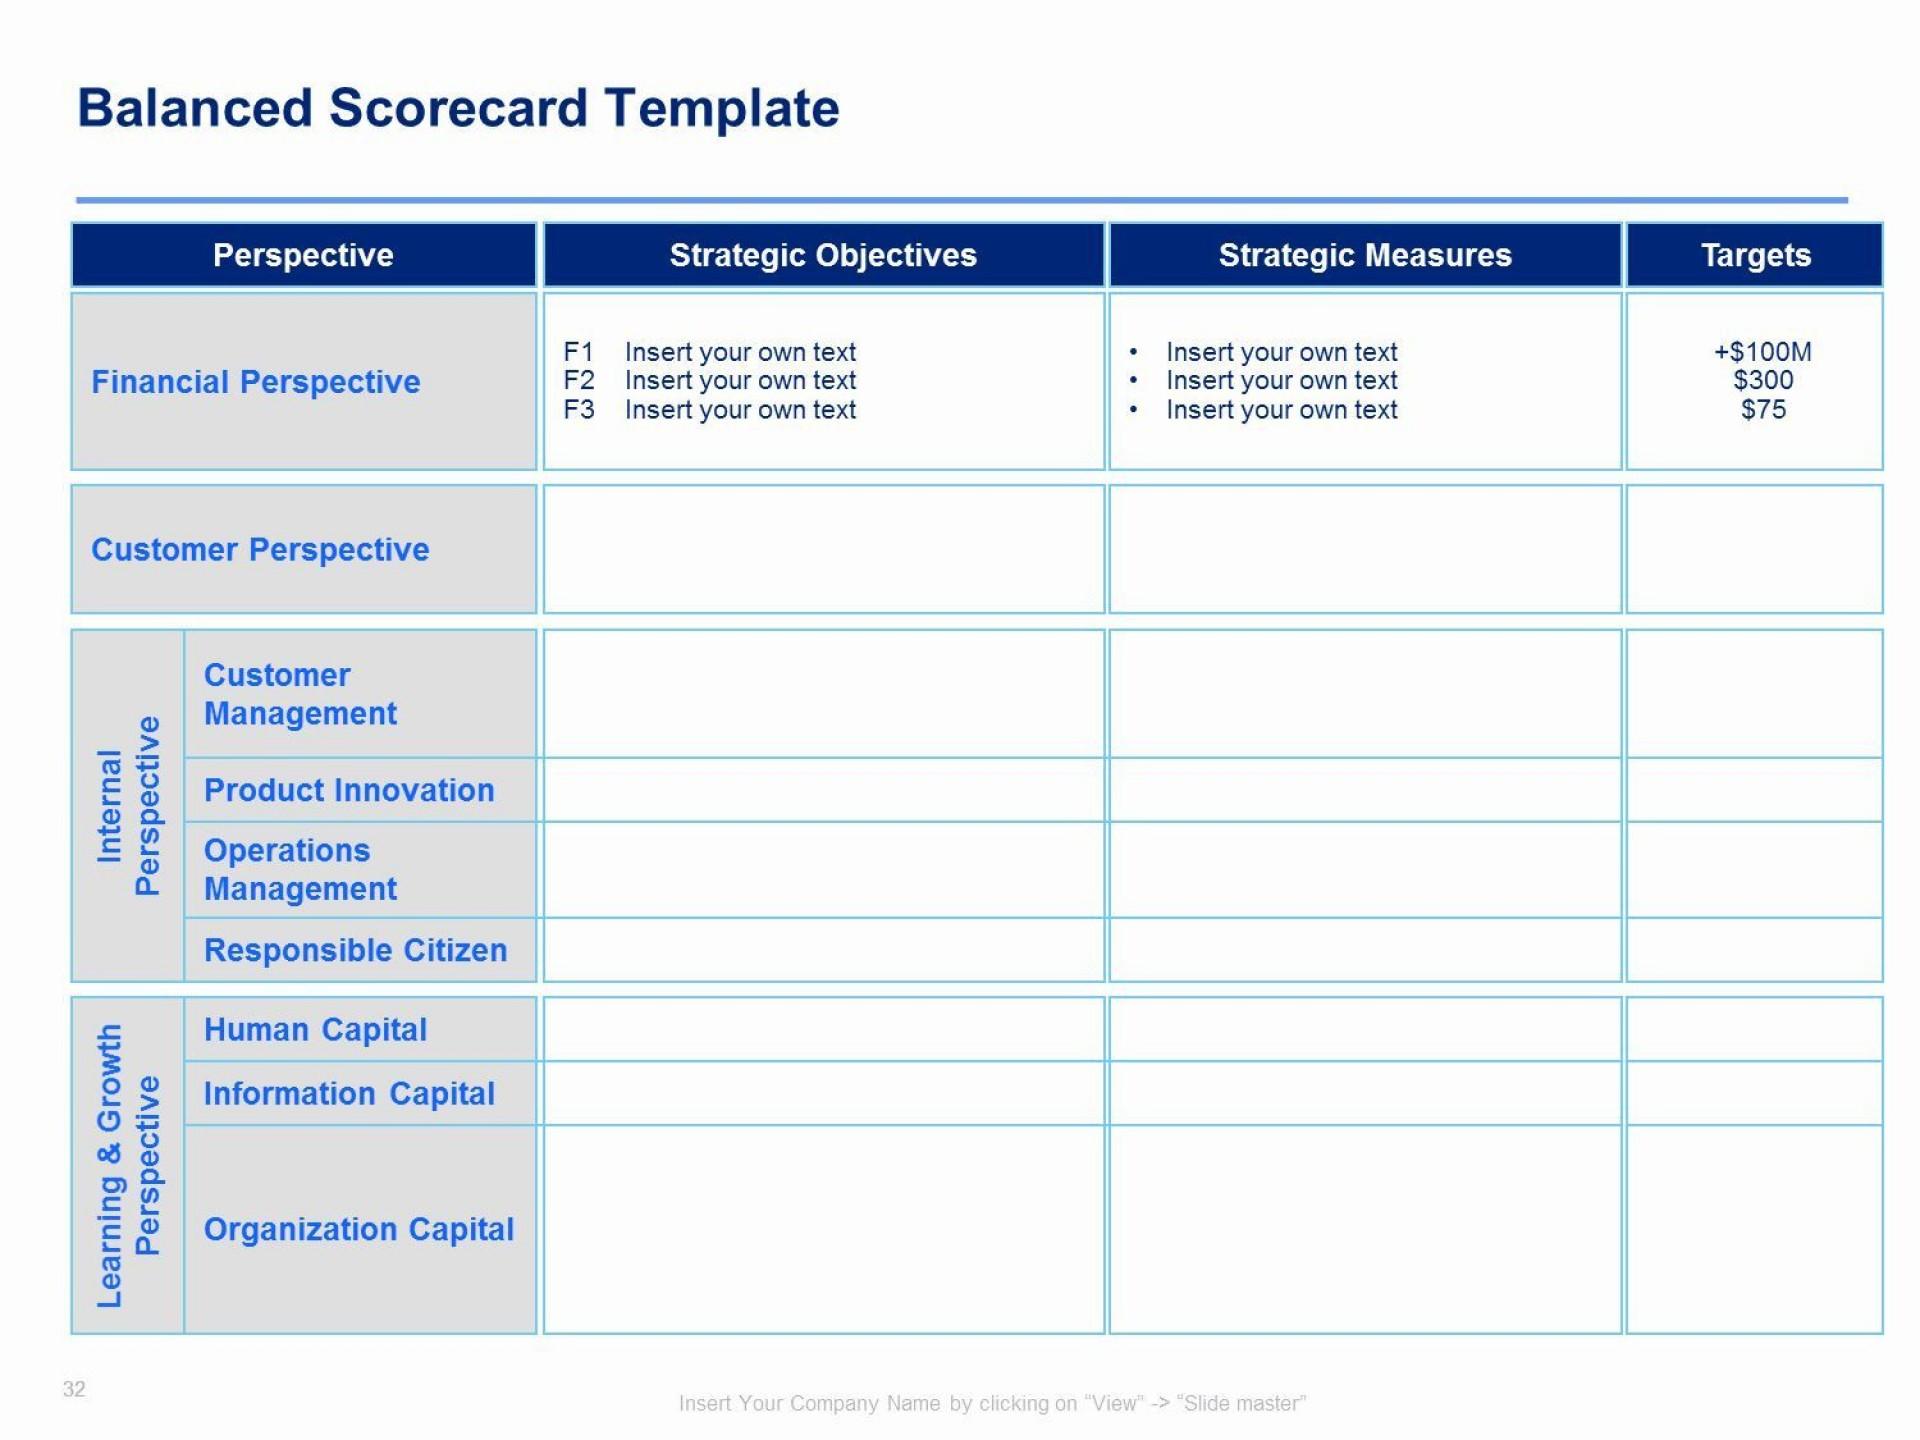 006 Impressive Score Busines Plan Template High Definition  Small1920